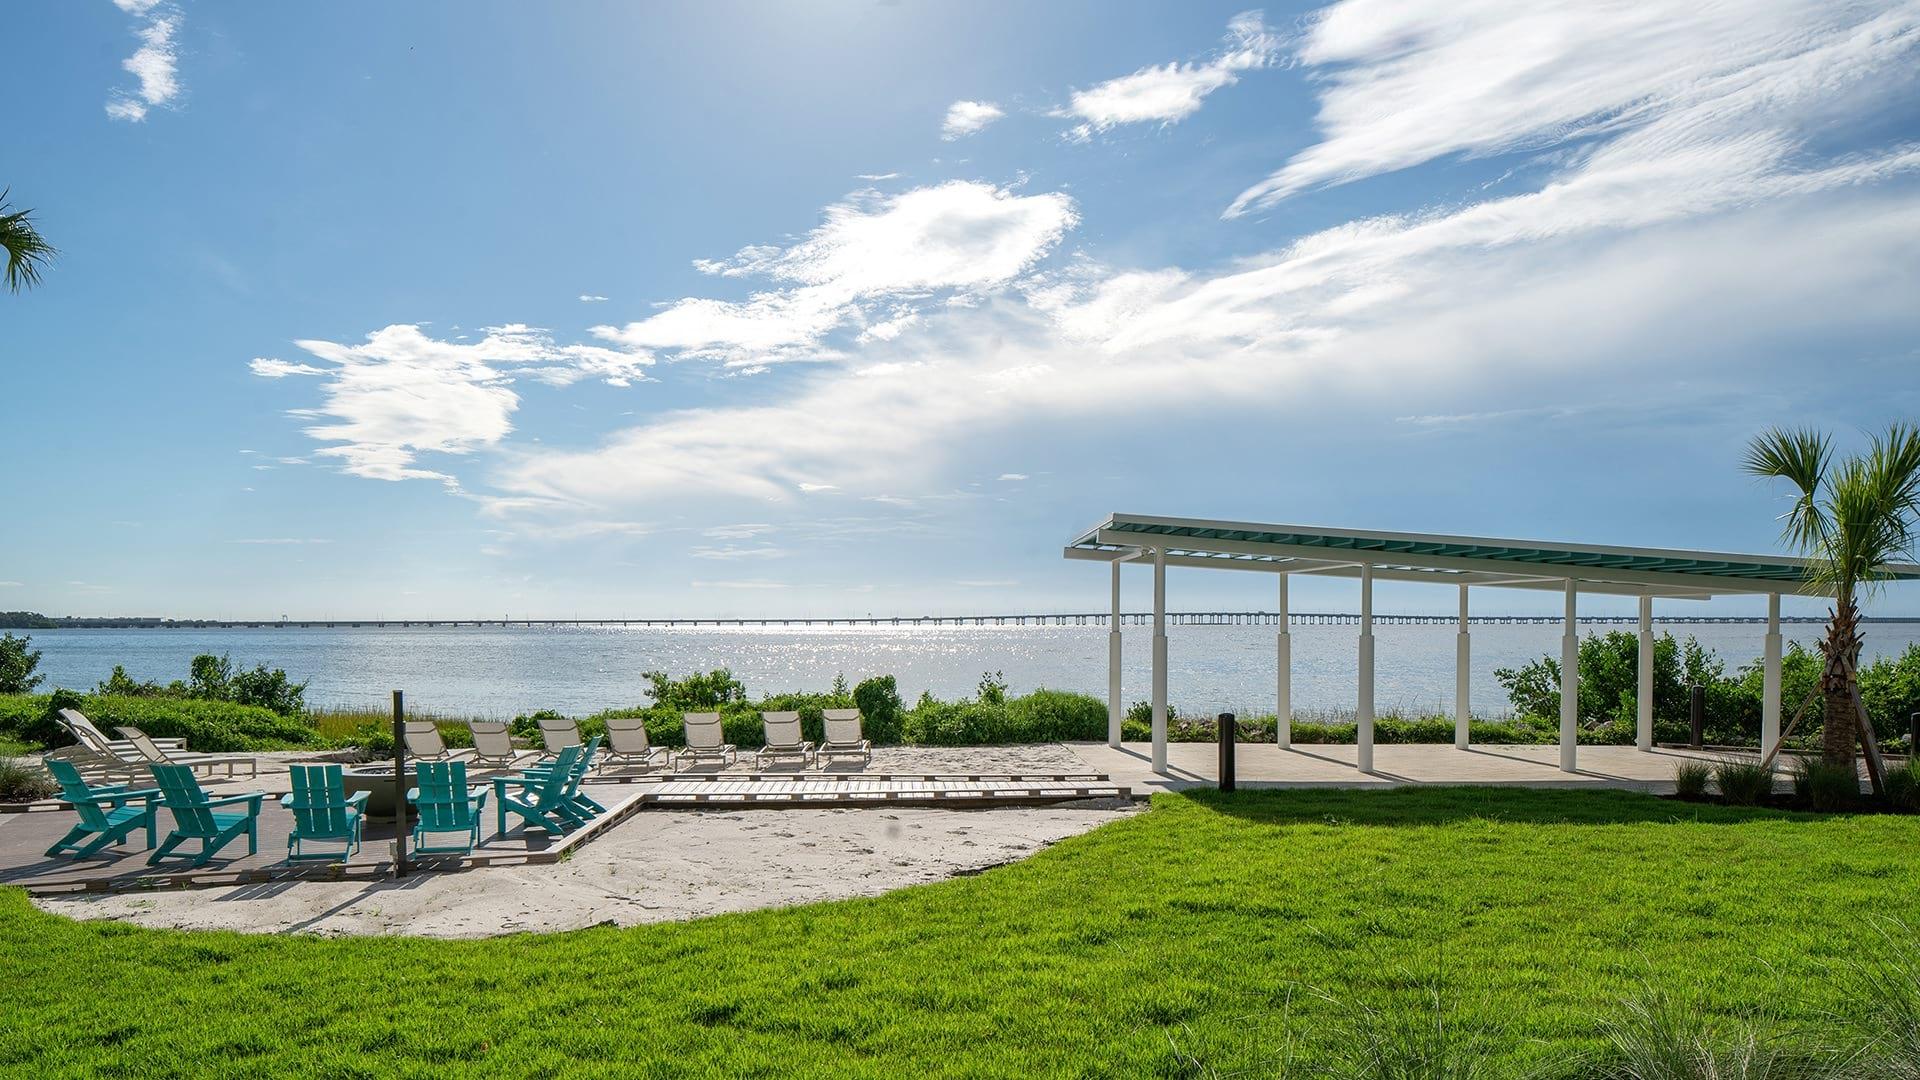 Waterfront views at our Tampa Bay apartments